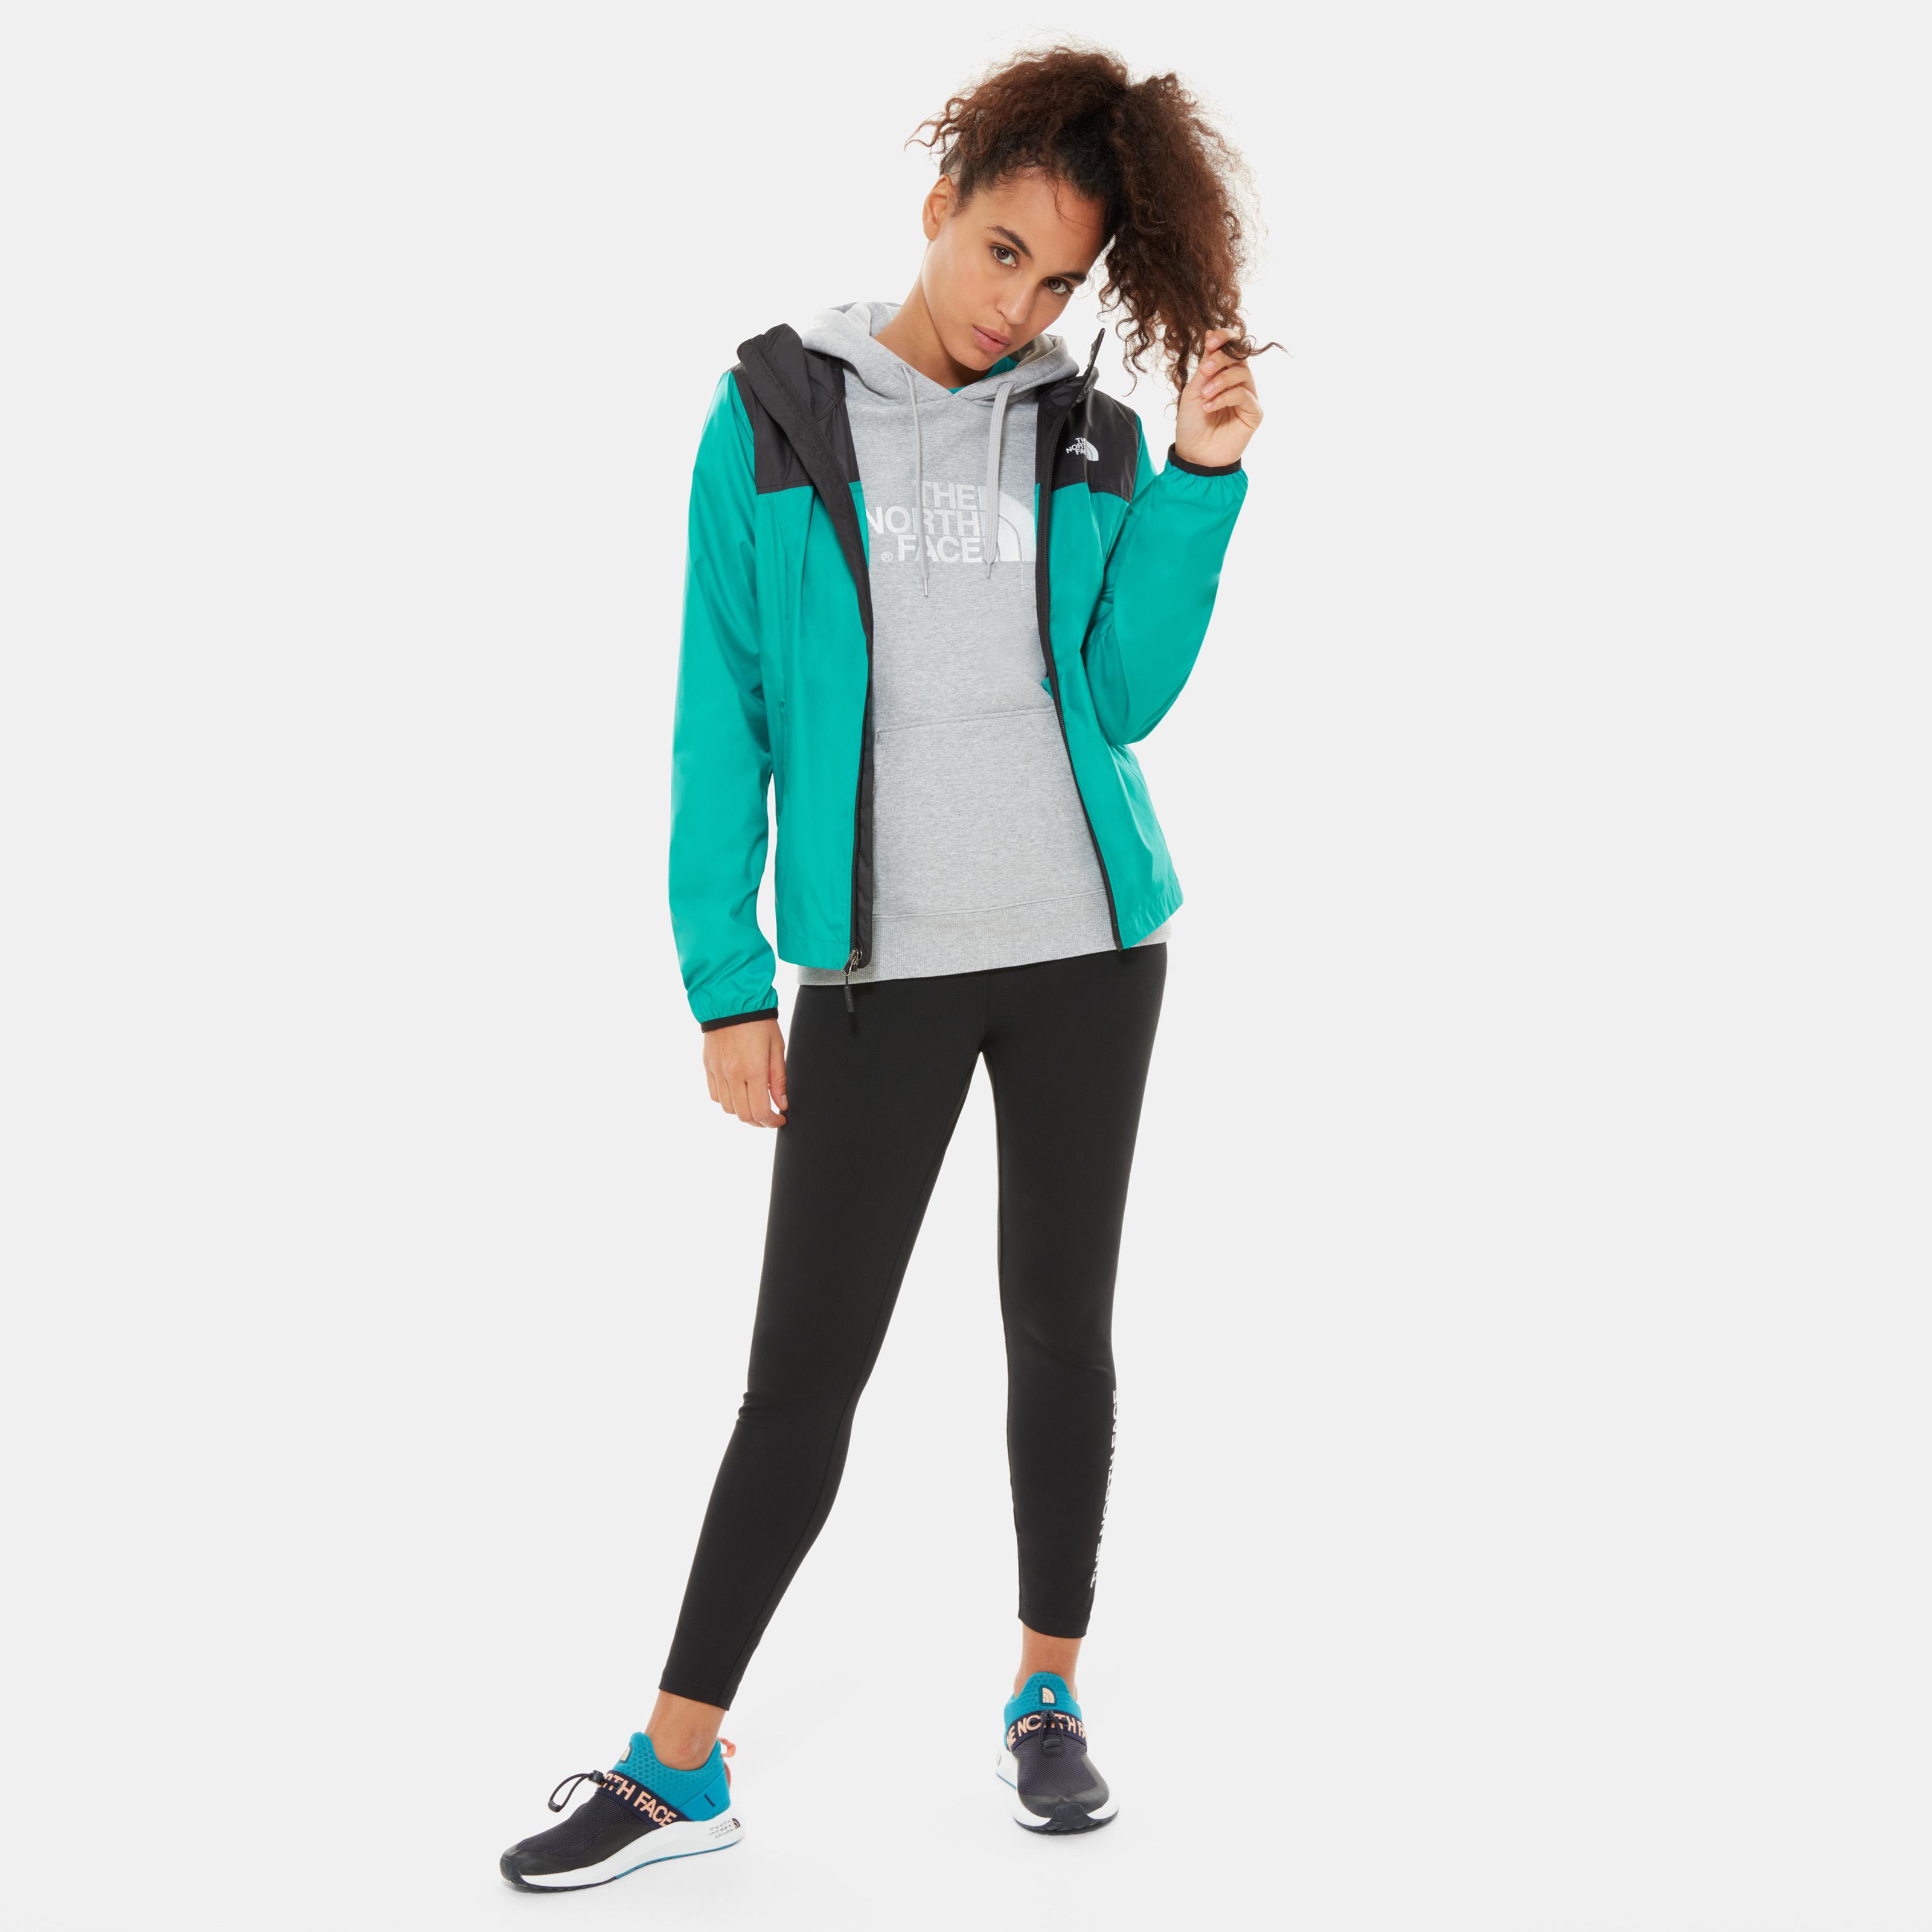 Фото #1: Женская куртка Cyclone Packable